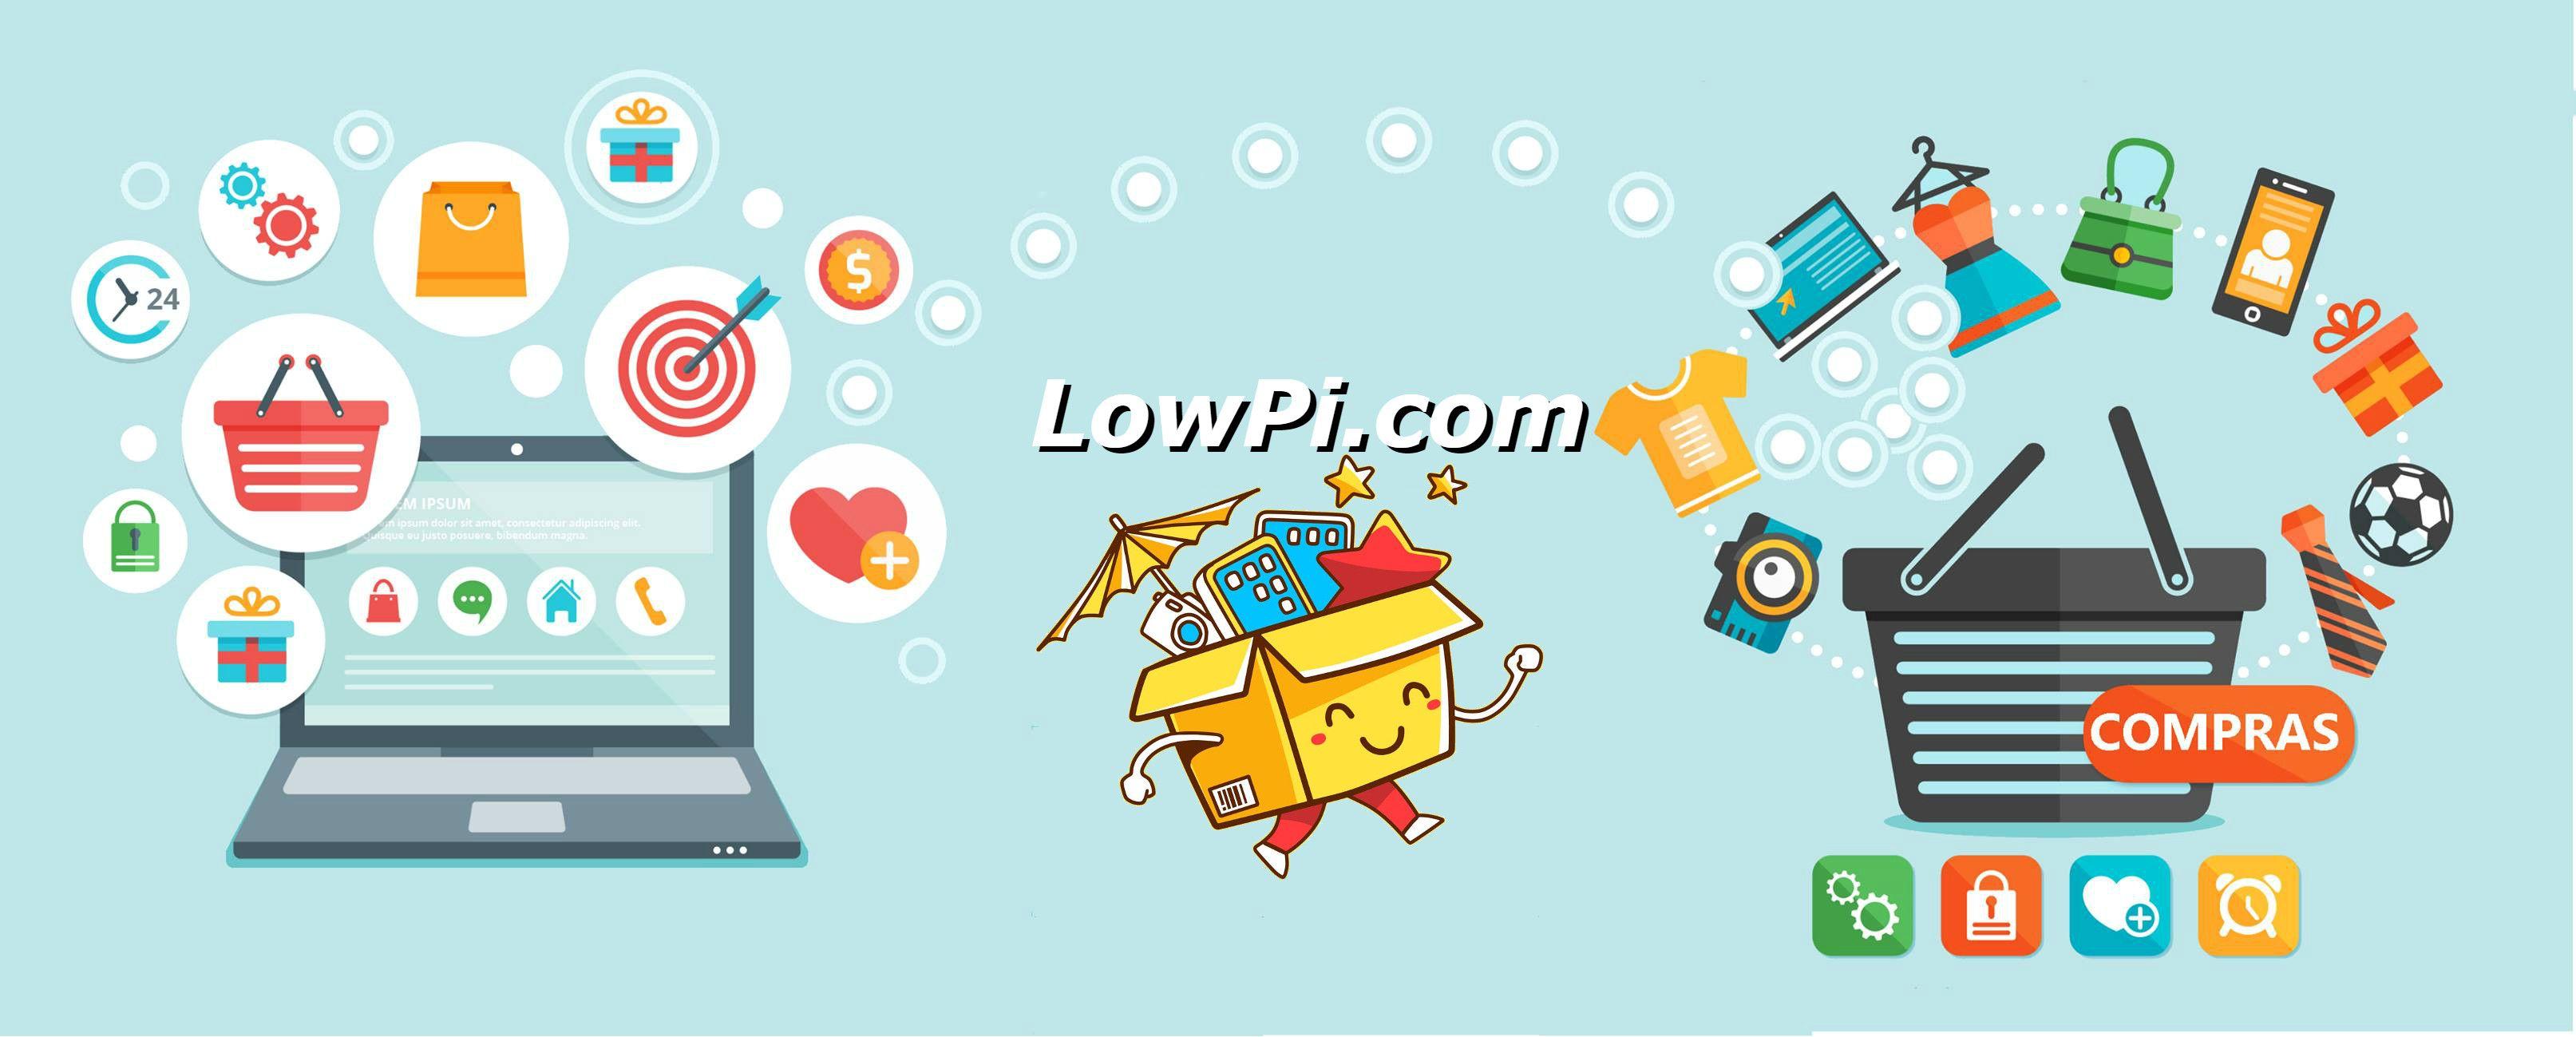 Fotografia Lowpi.com el mejor comparador de precios en línea